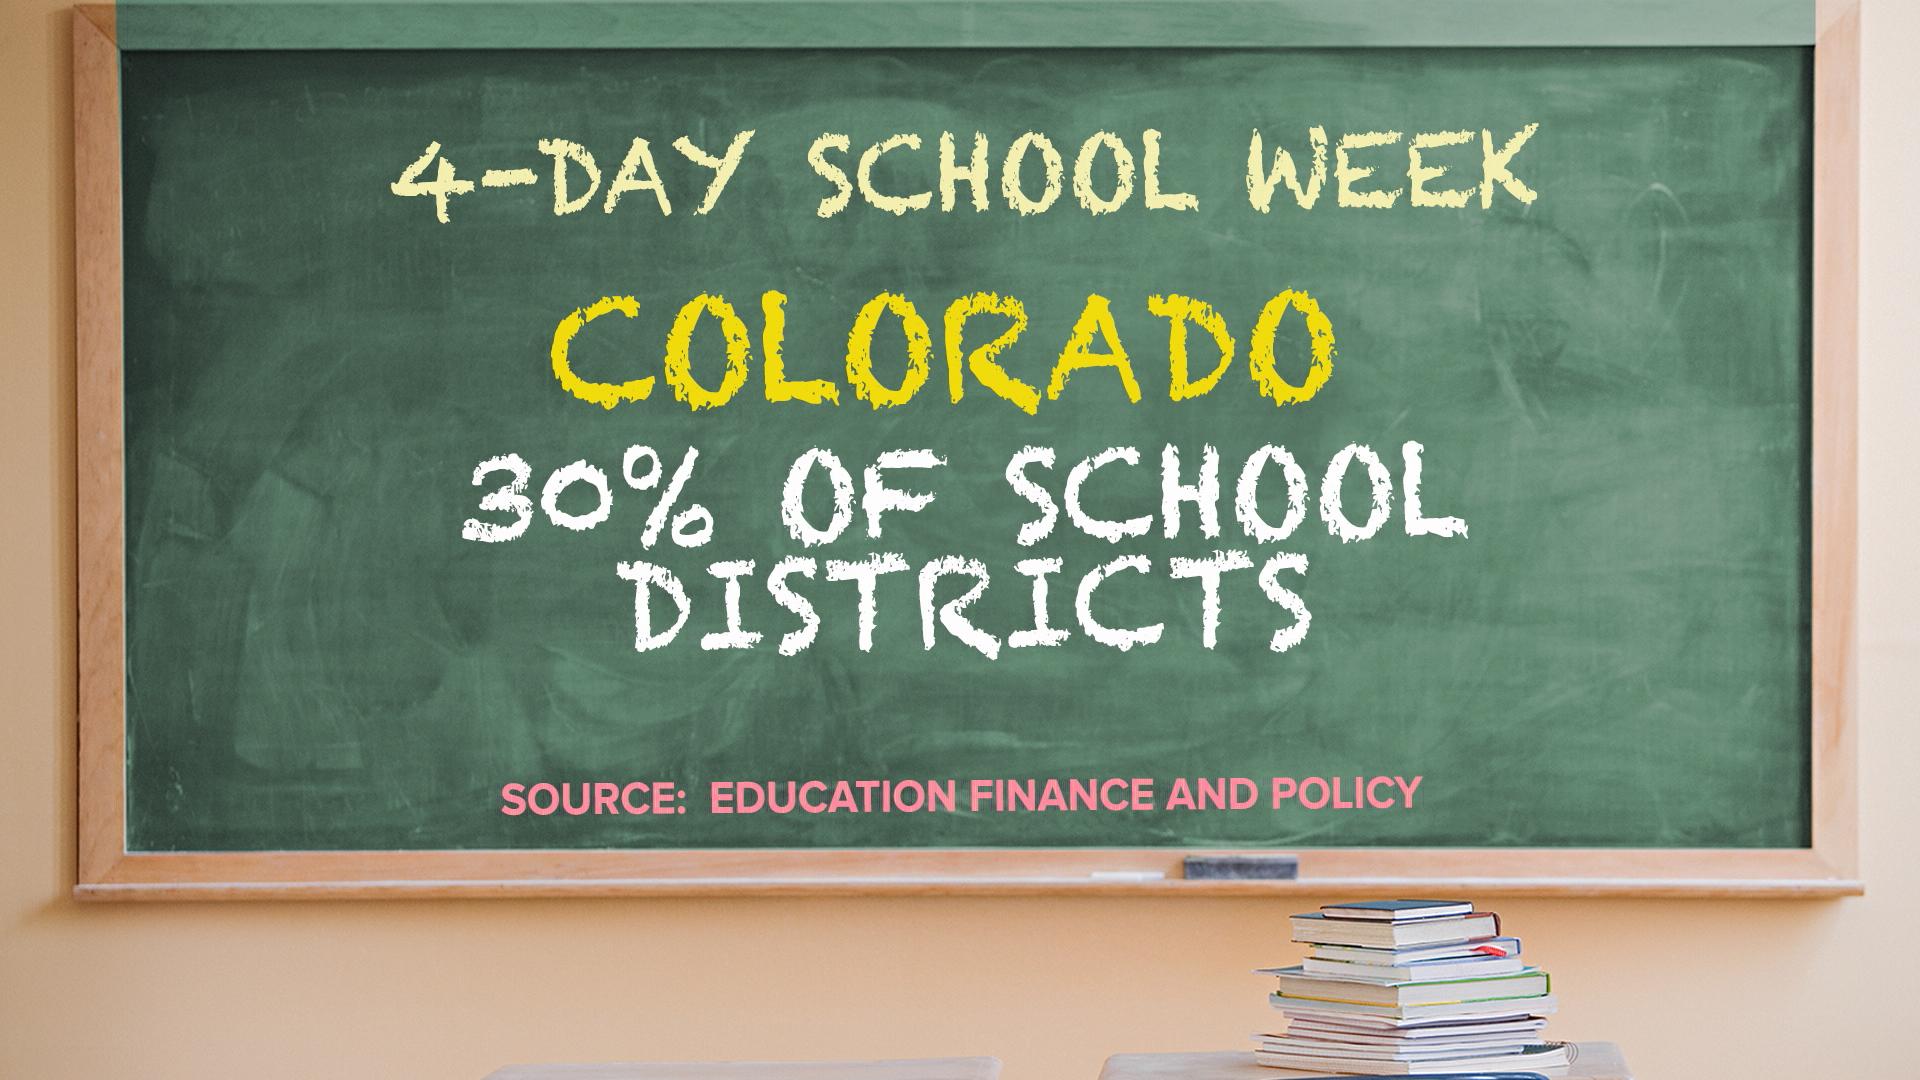 should we extend the school week